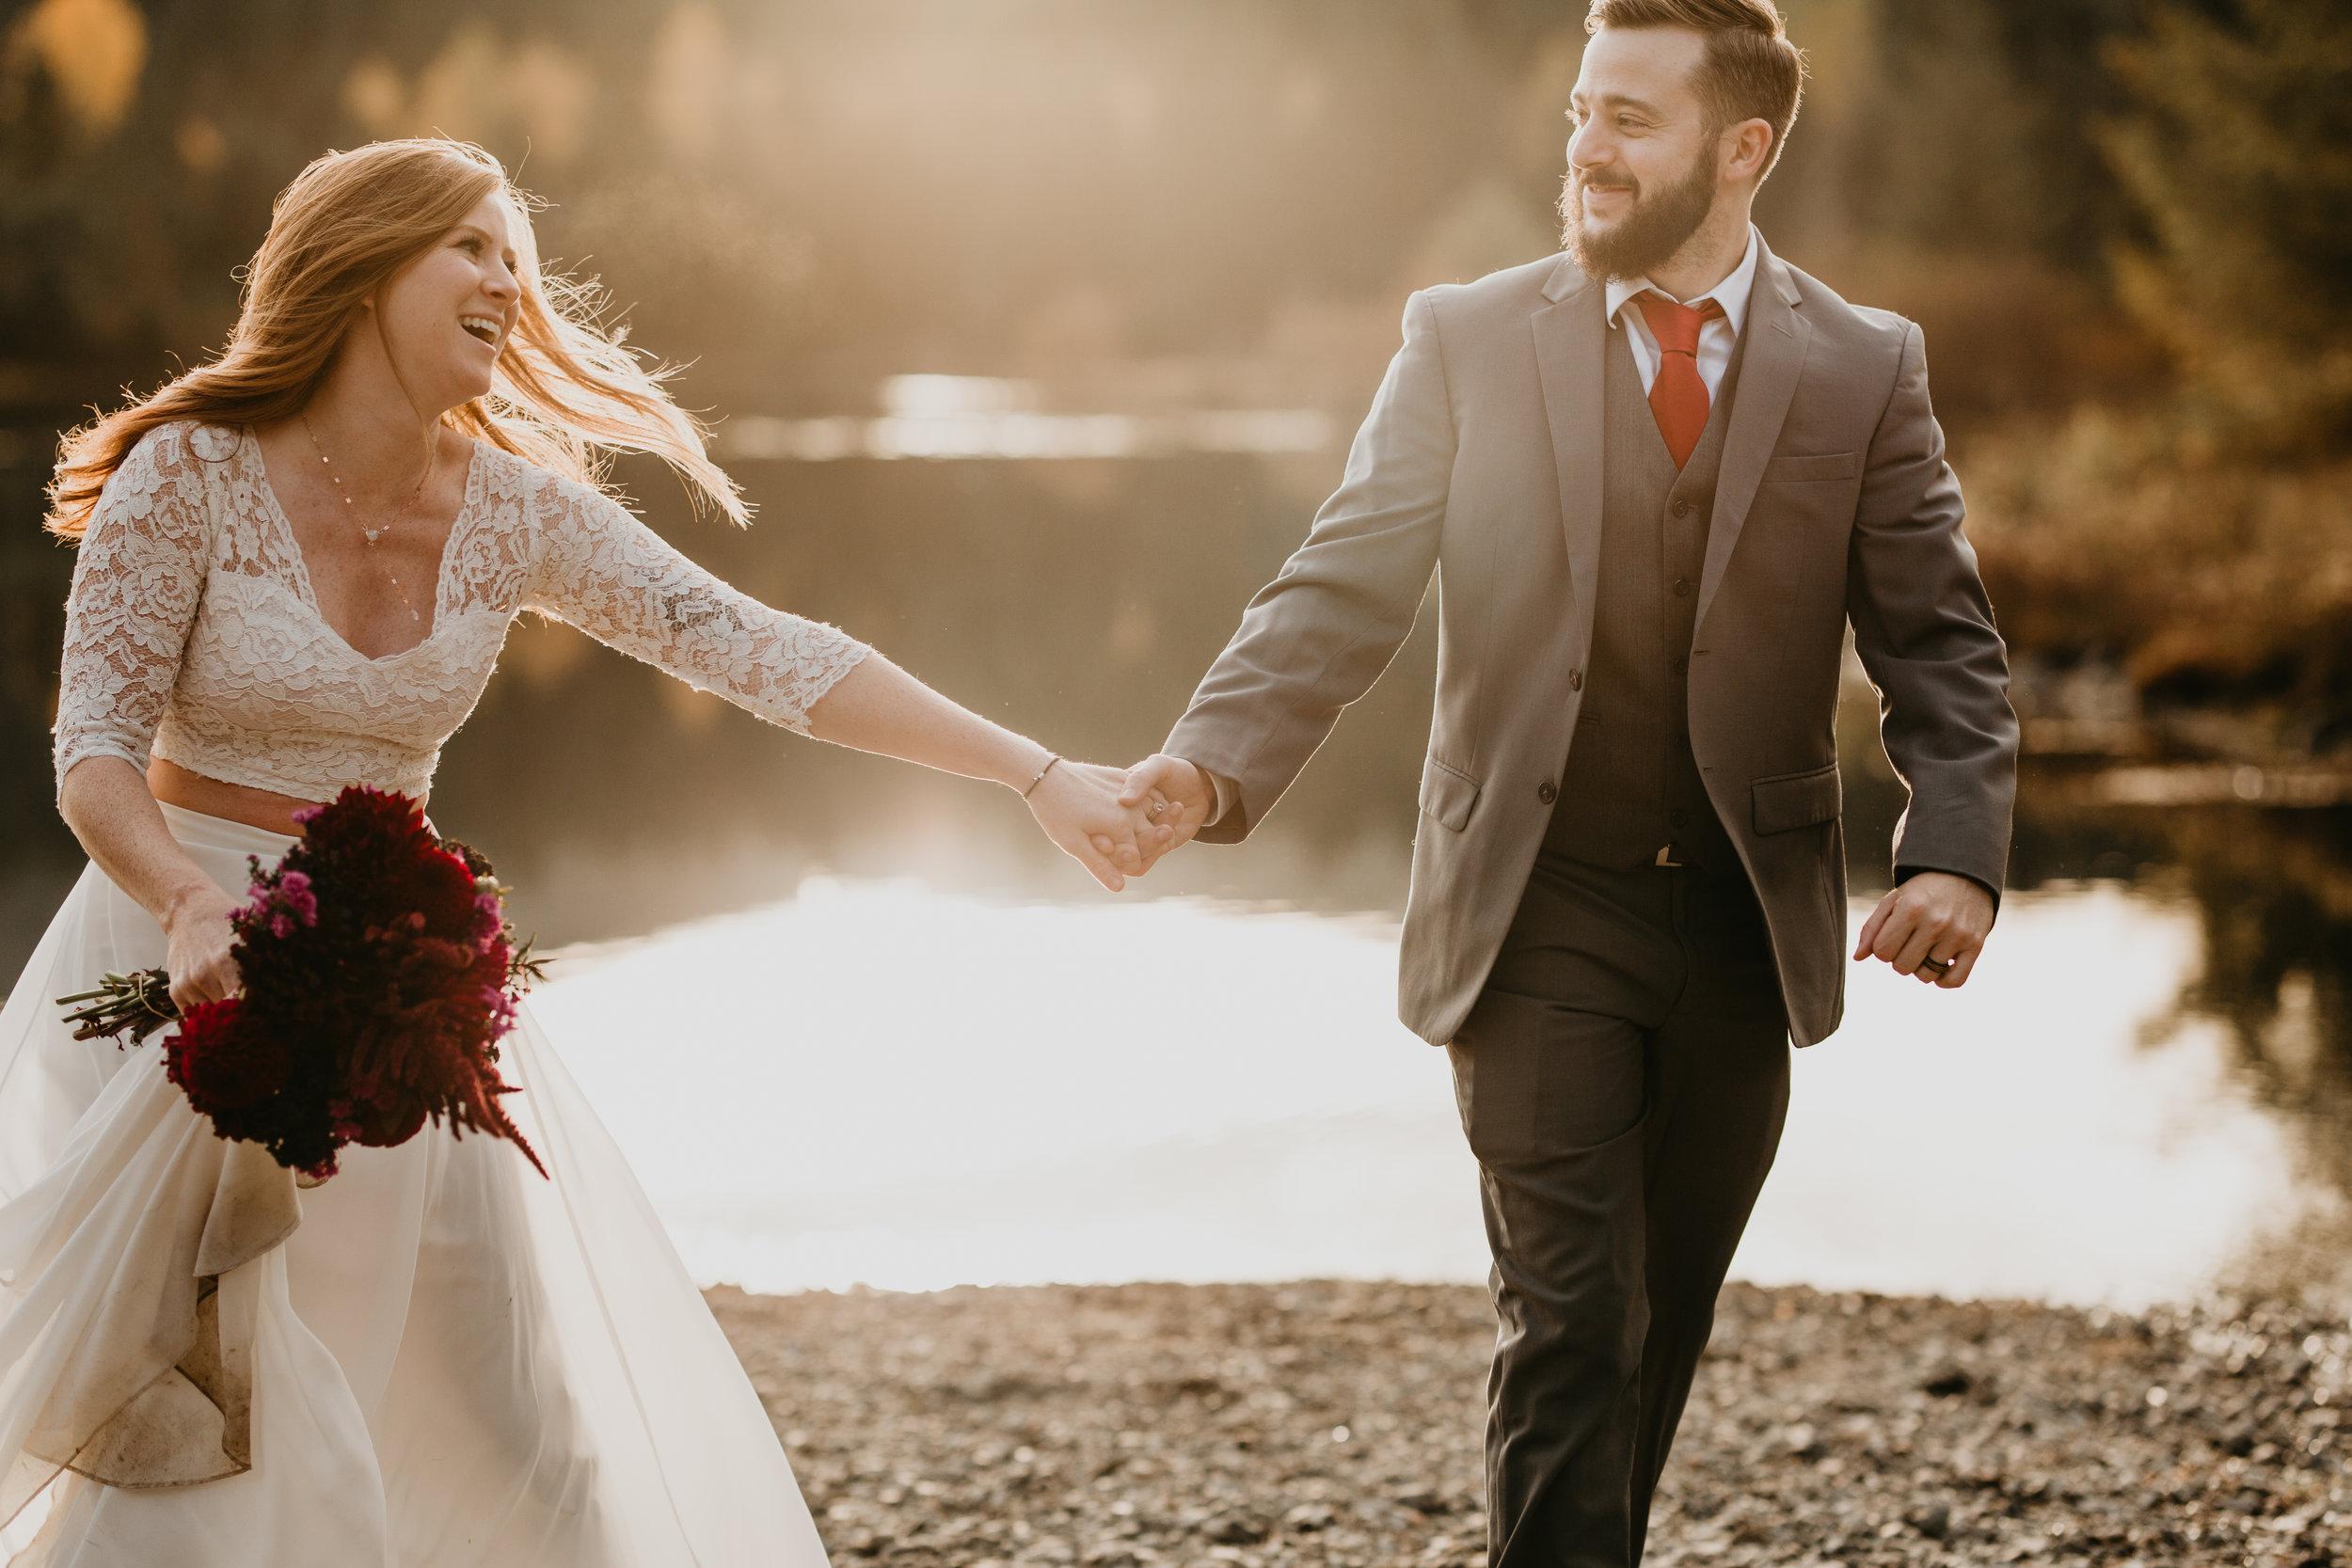 nicole-daacke-photography-mountain-view-elopement-at-gold-creek-pond-snoqualmie-washington-wa-elopement-photographer-photography-adventure-elopement-in-washington-fall-lakeside-golden-sunset-boho-fun-bride-2785.jpg